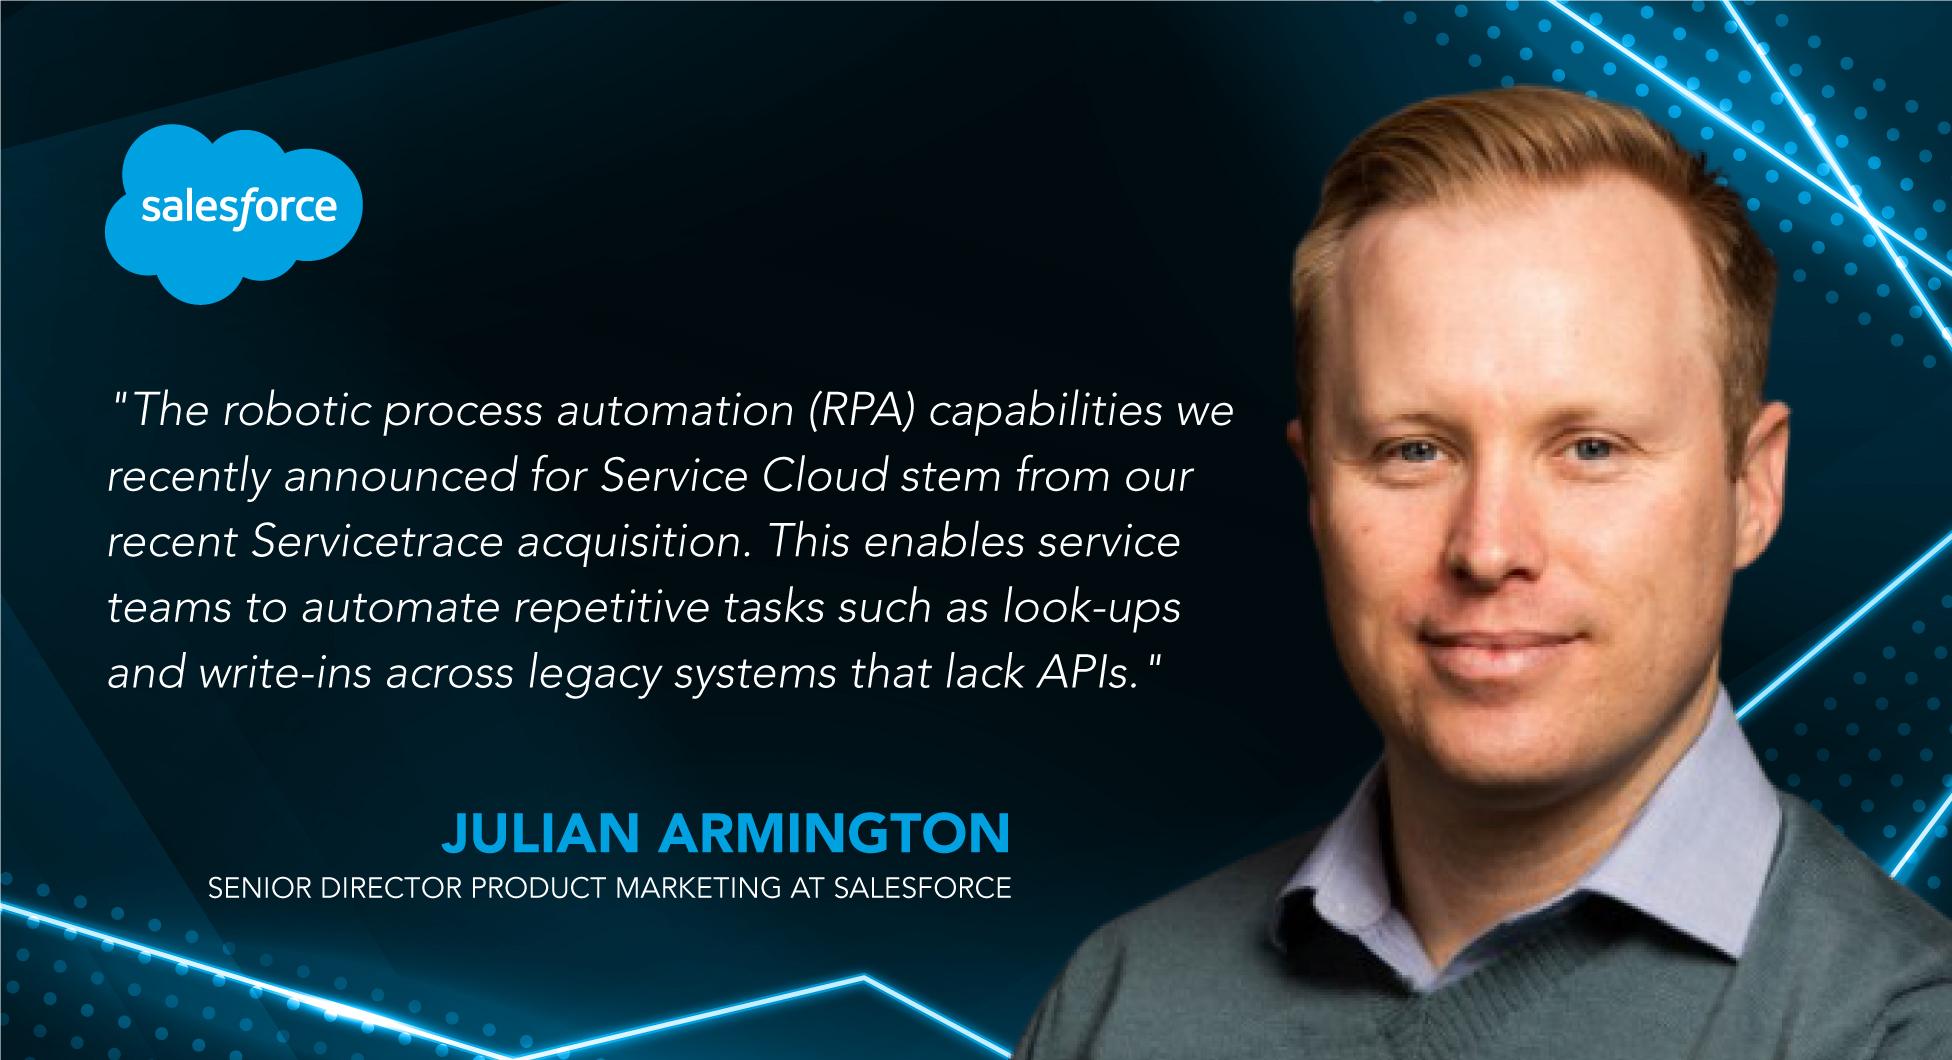 Julian Armington, Senior Director Product Marketing at Salesforce